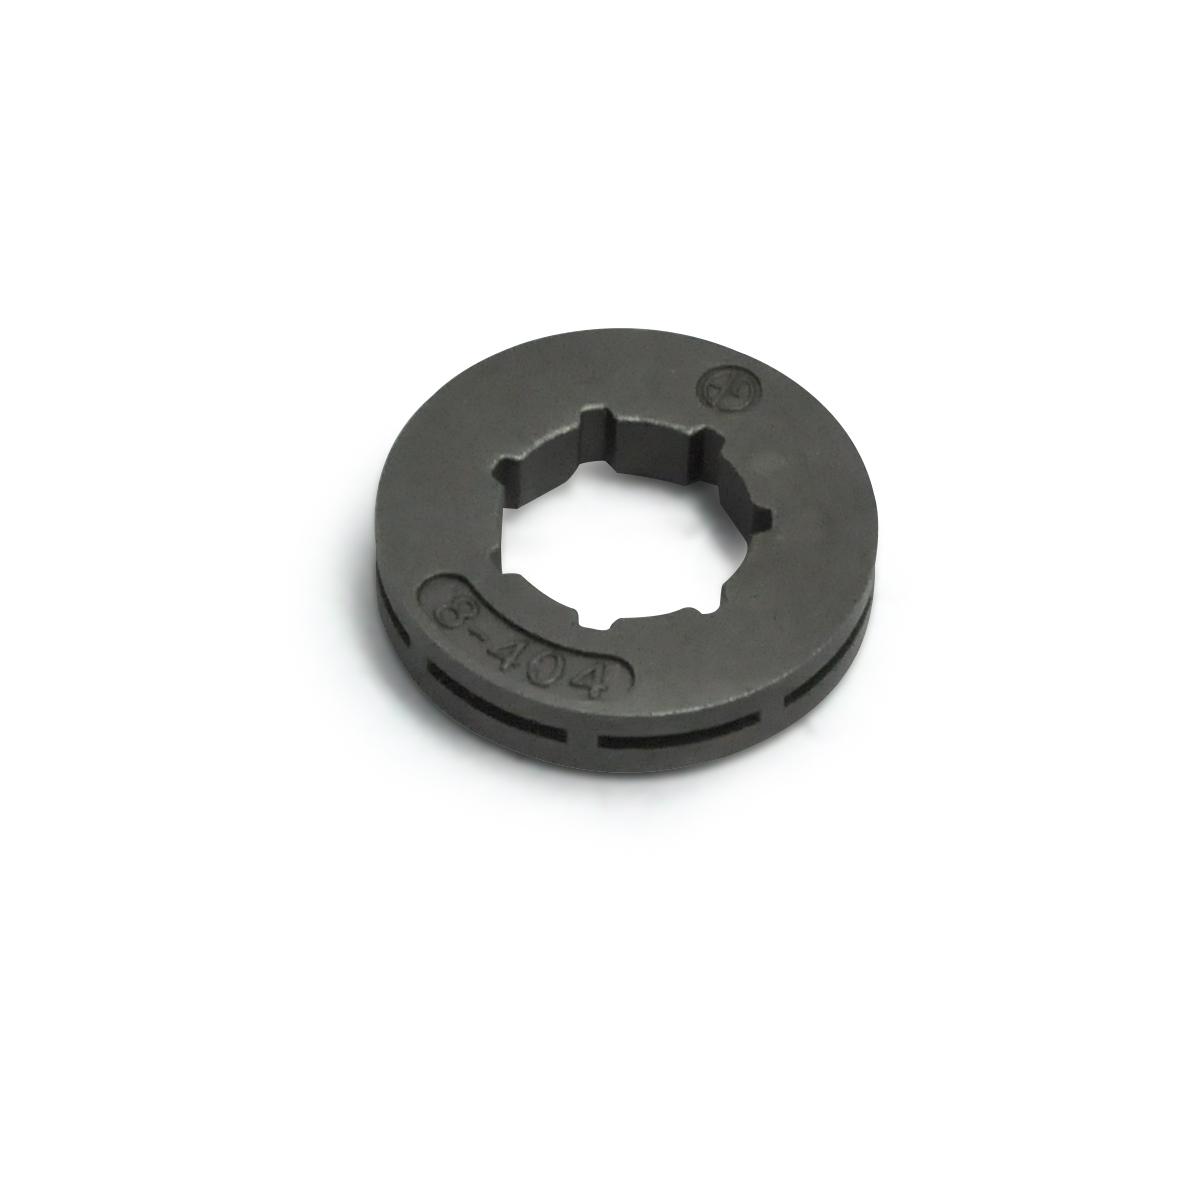 "404/""-8T Tooth Rim Sprocket Fits Stihl 050 051 066 070 075 076 090 088 Chain Saws"